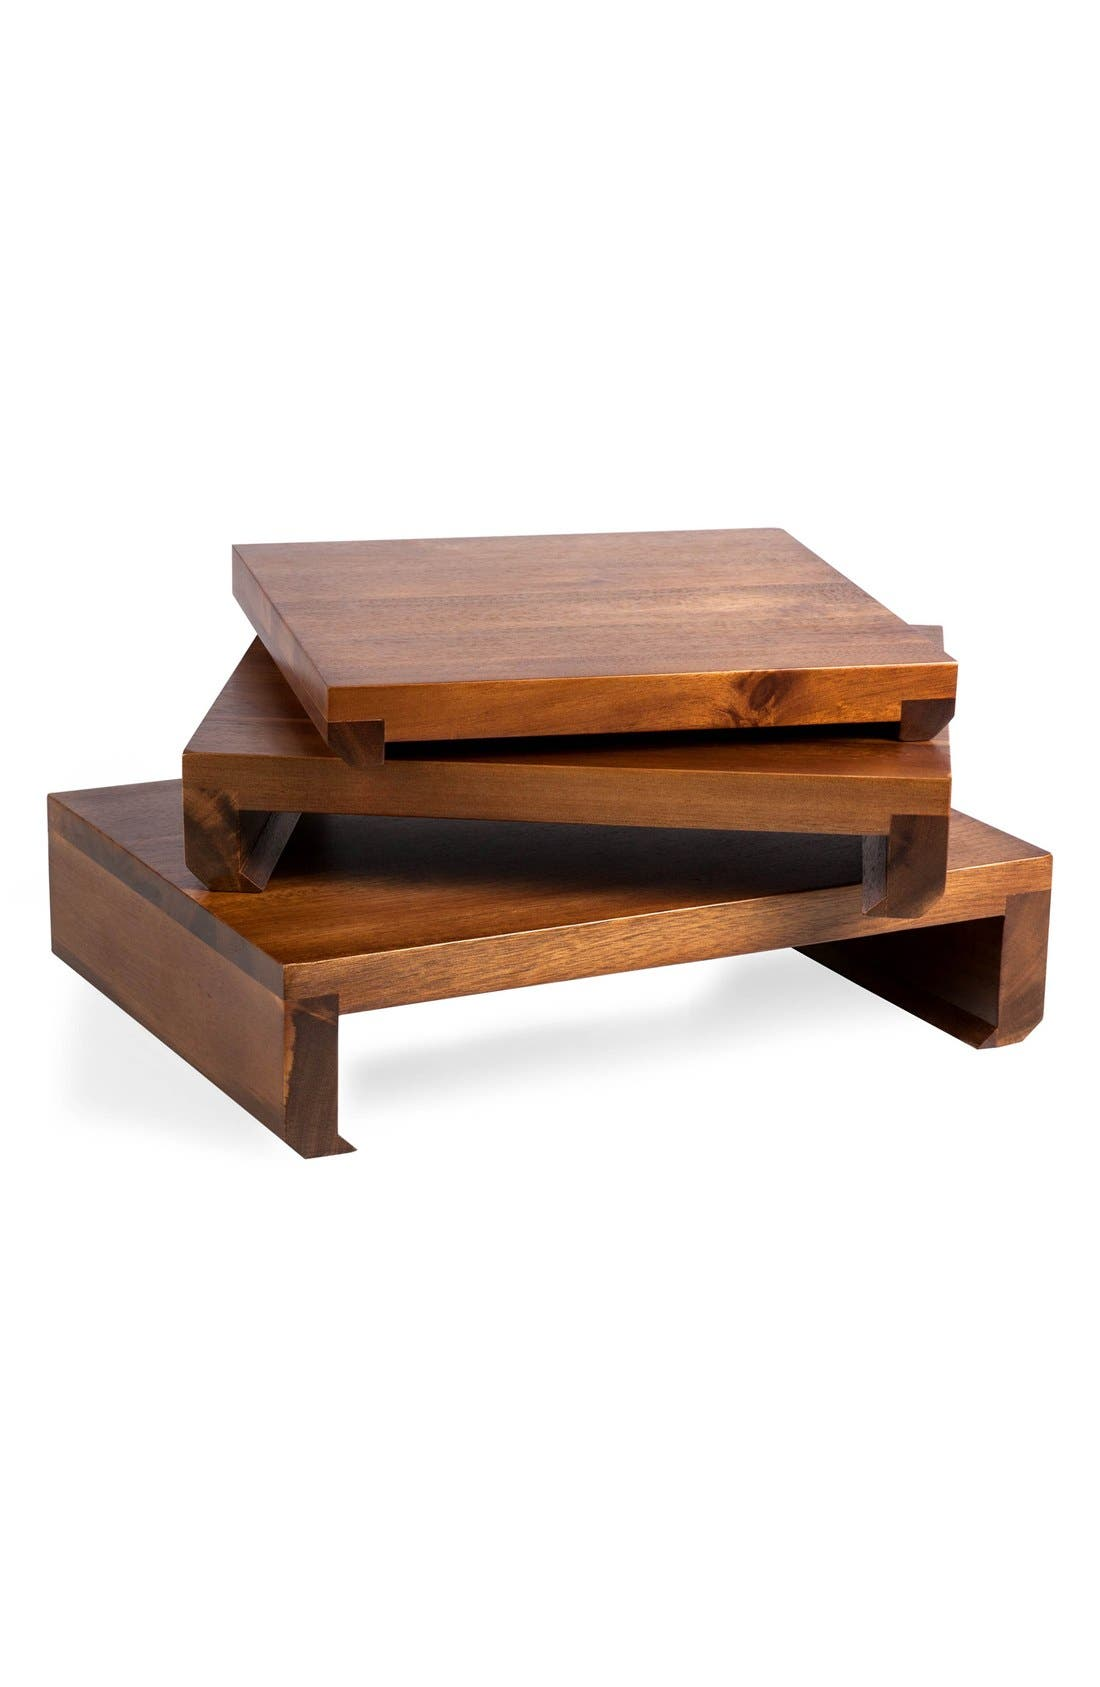 Main Image - Picnic Time 'Etage' Wood Serving Pedestals